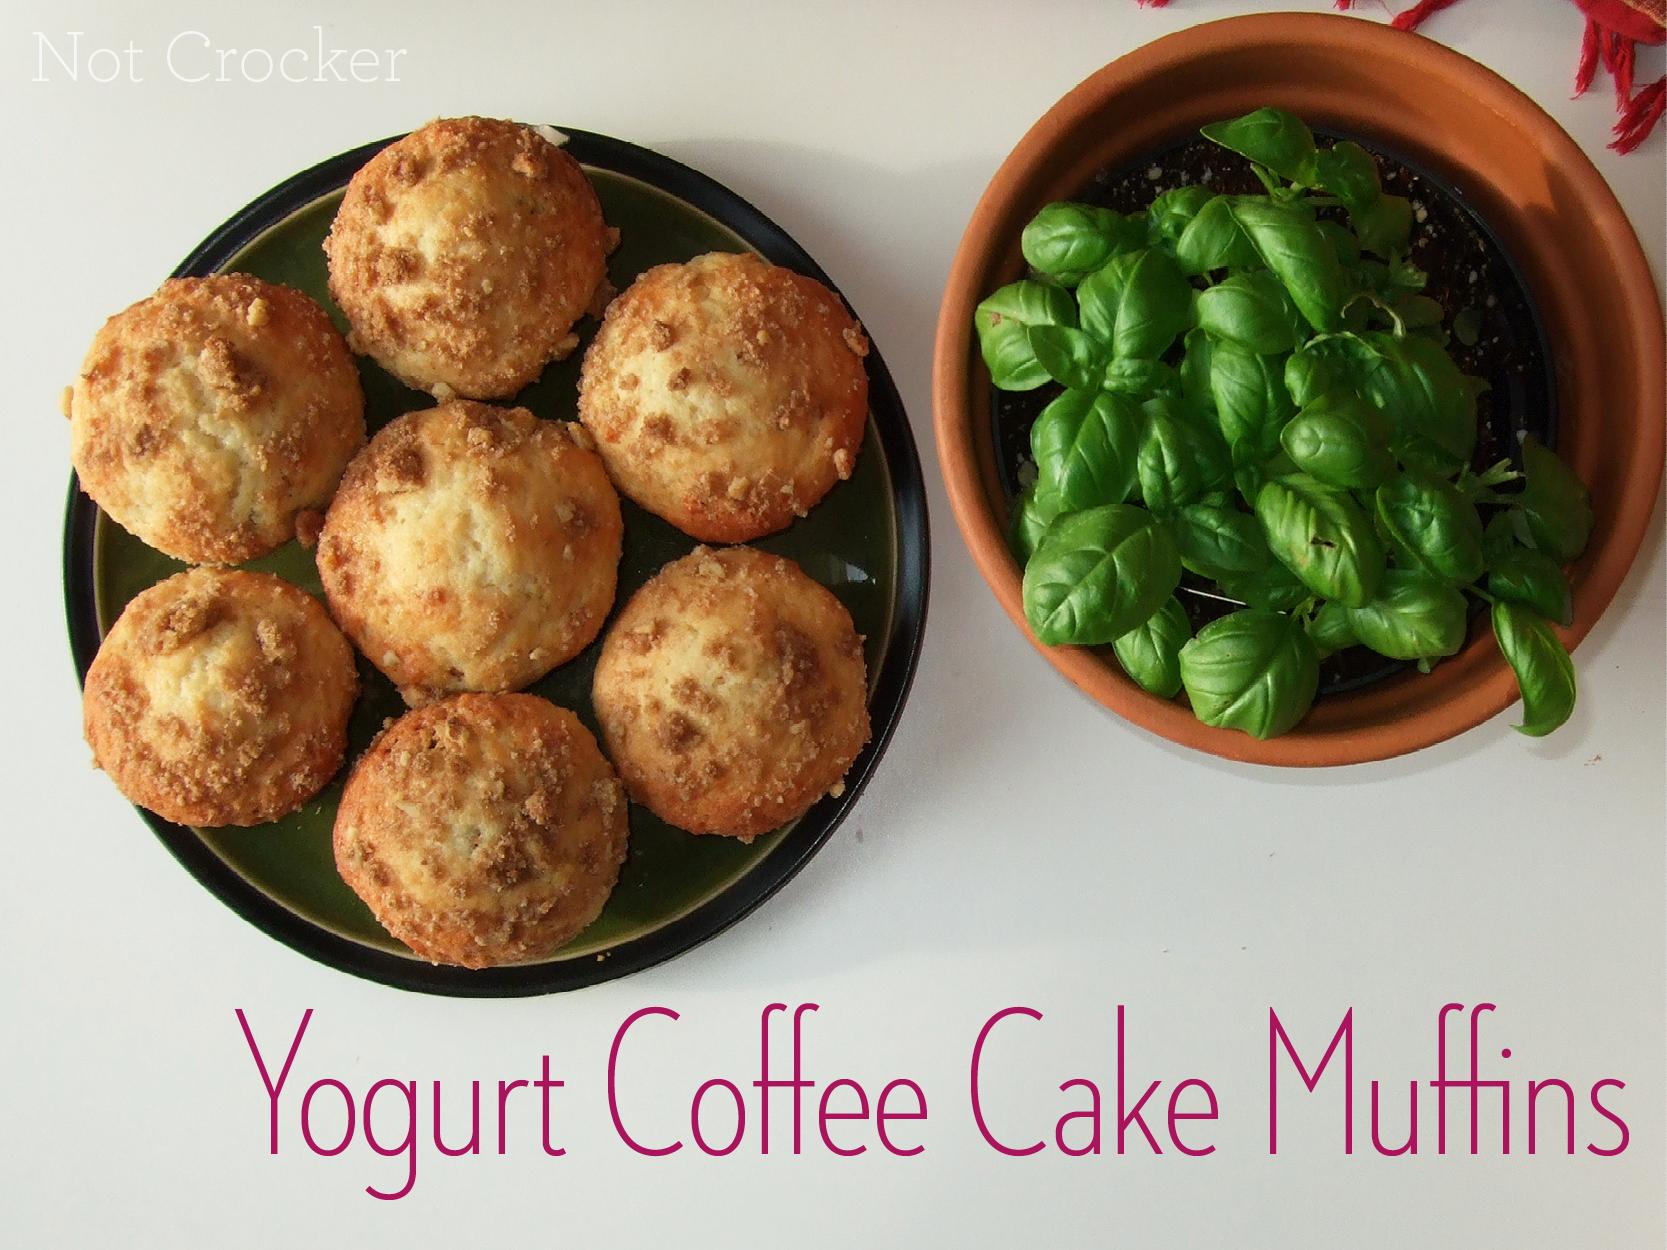 Yogurt Coffee Cake Muffins |